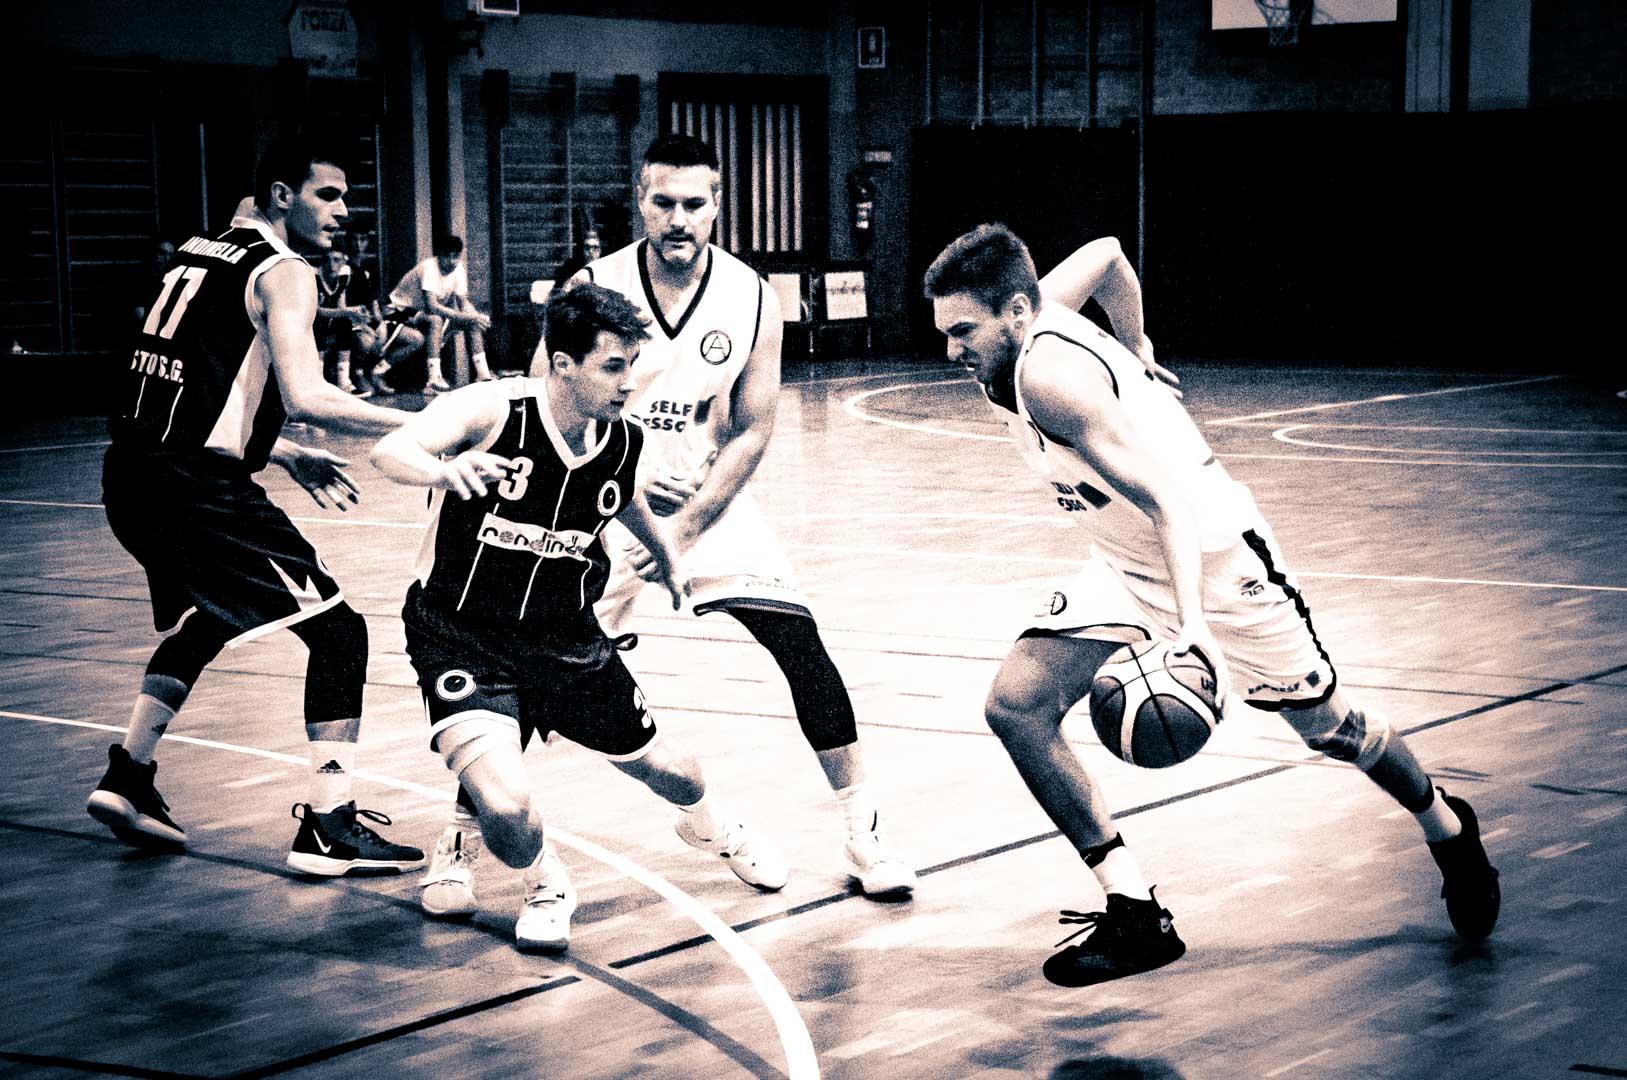 Serie C: Basket Rondinella 89 – Nuova Argentia Pallacanestro 83